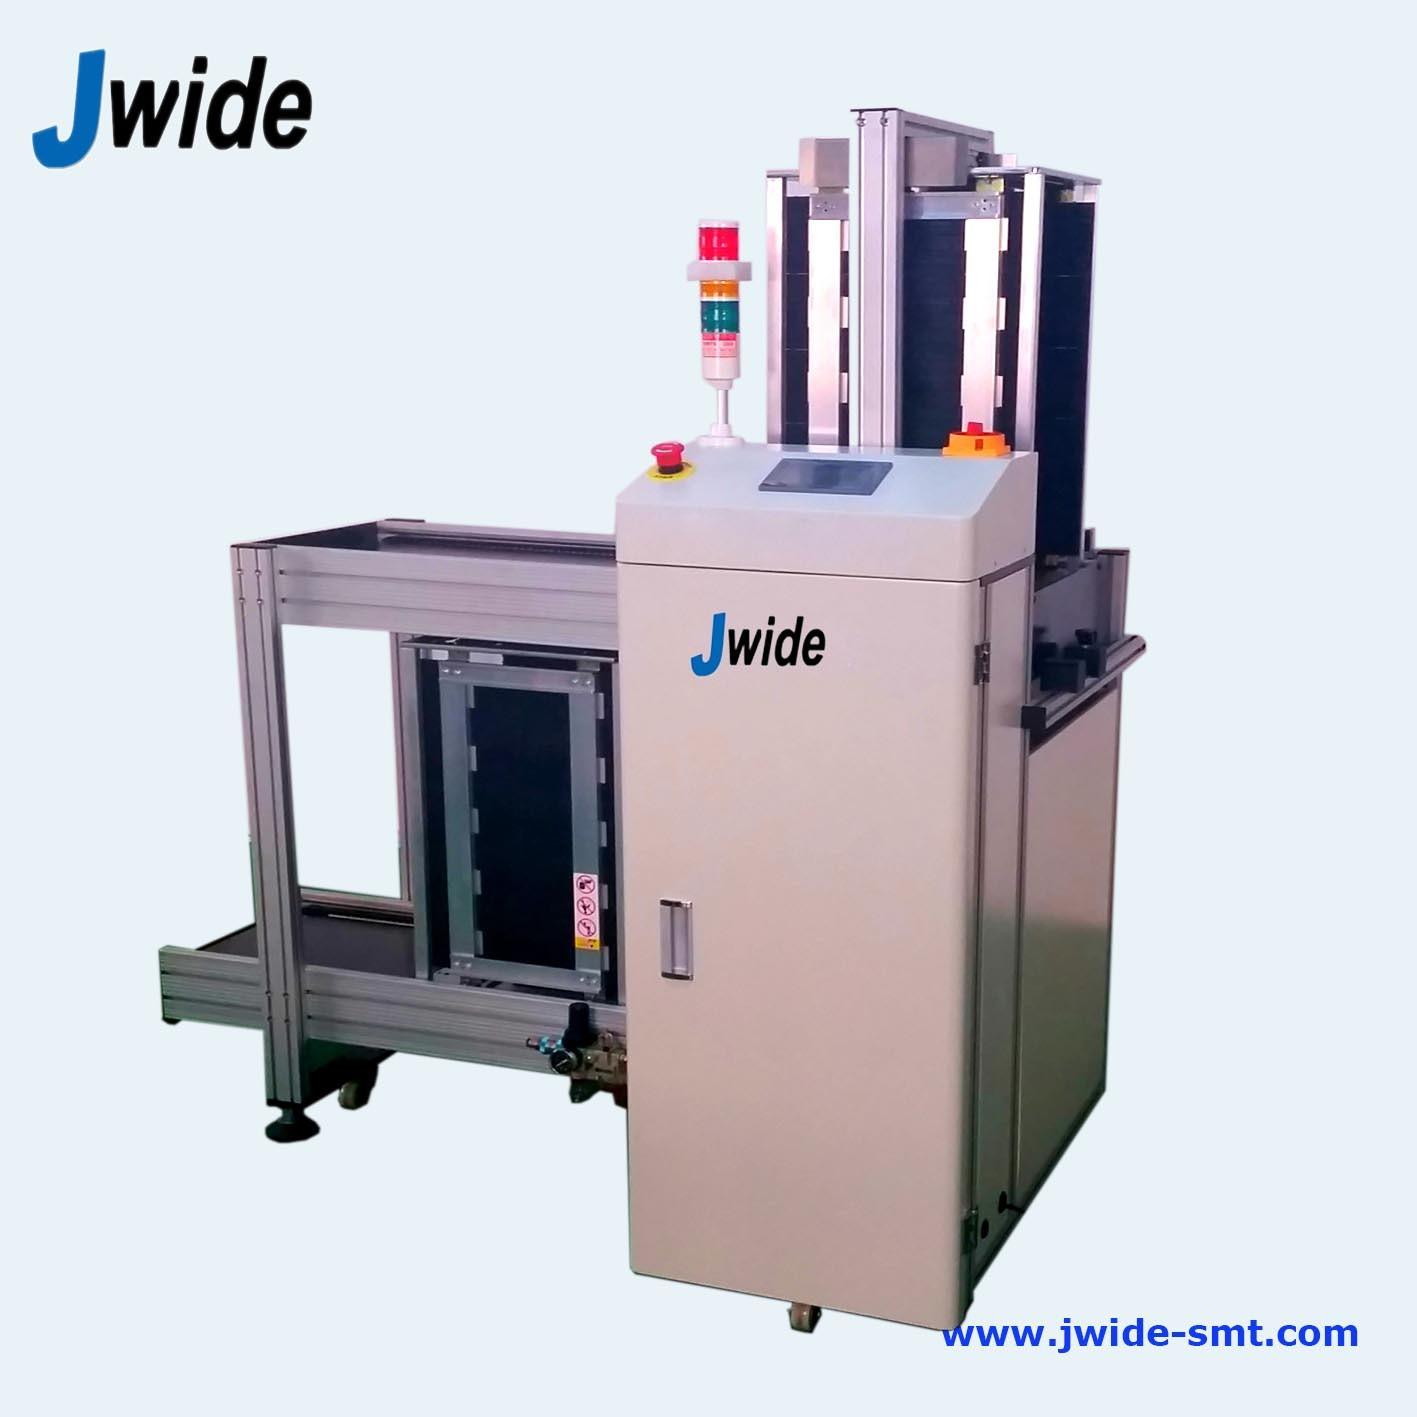 High Efficiency Stm Loader and Unloader for PCB Manufacturing